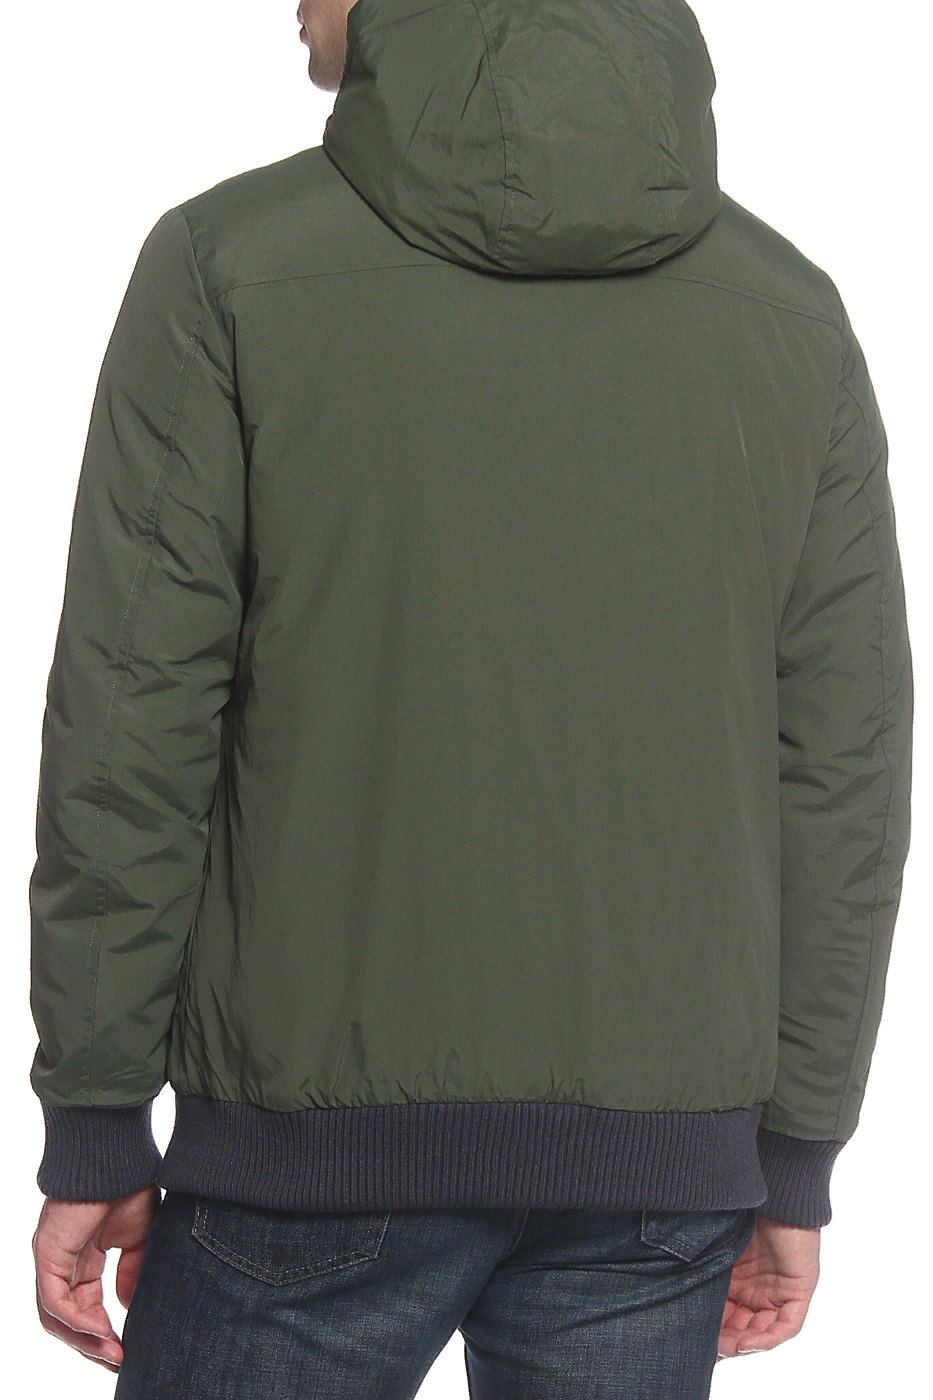 63a088fc5bfc Куртка мужская Kappa   МегаСпорт